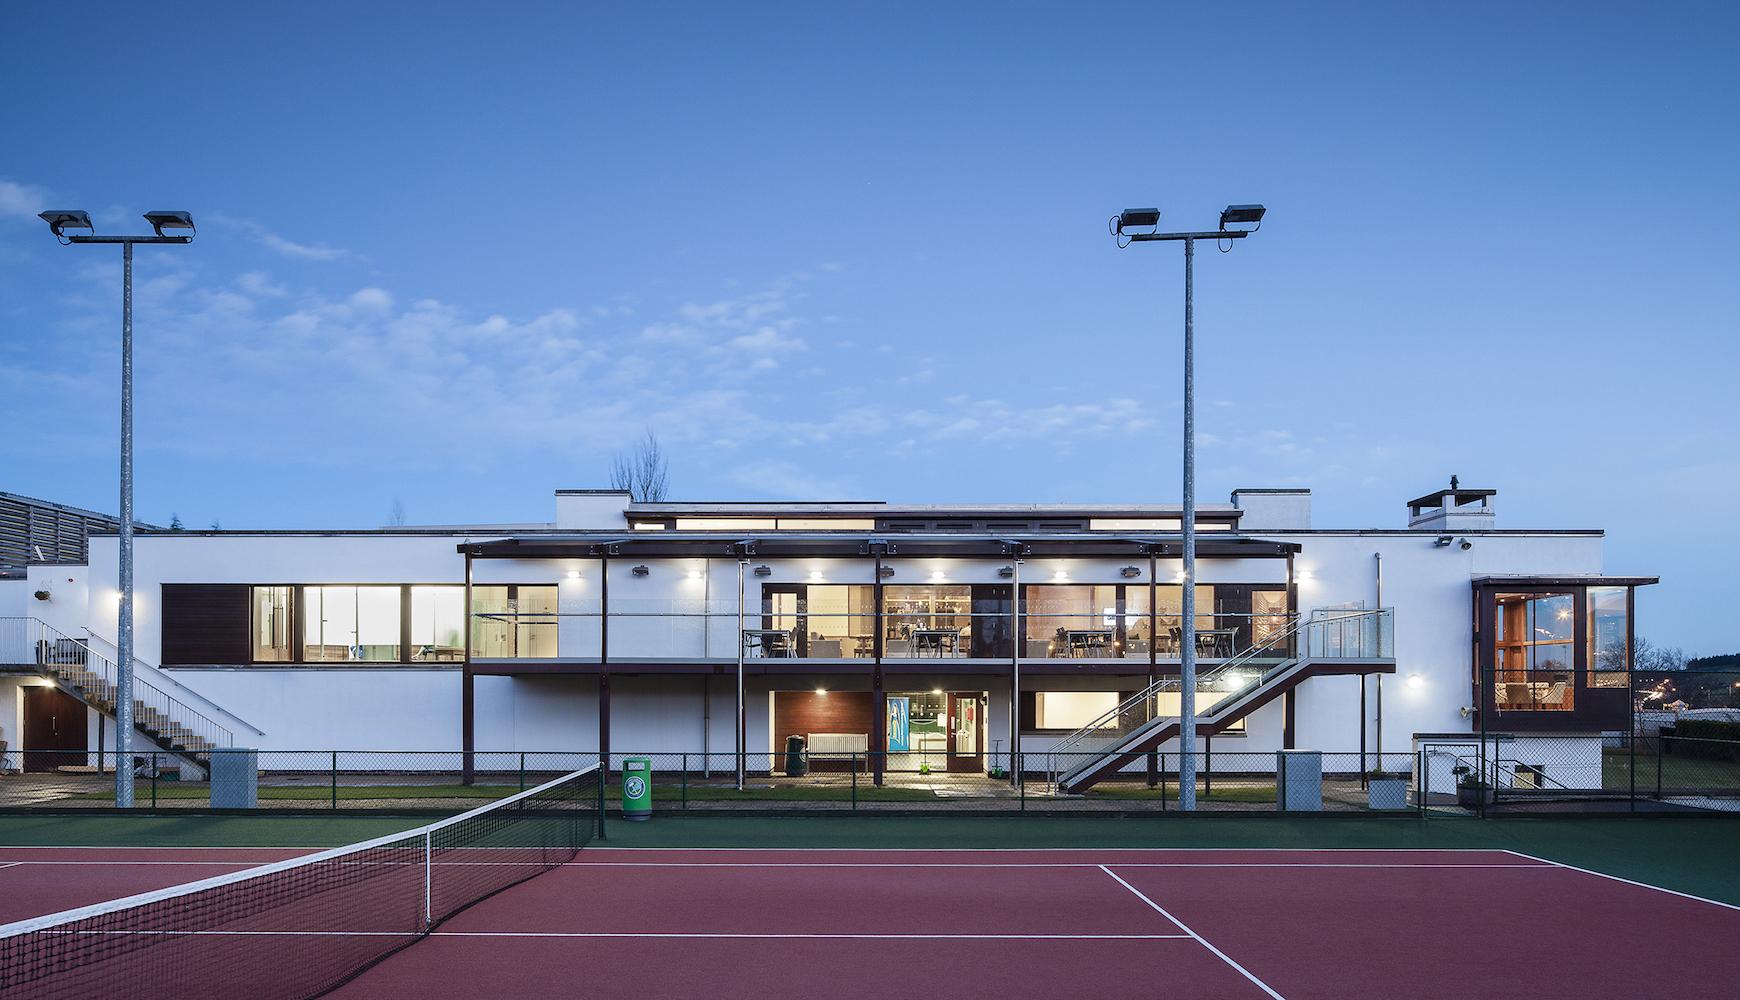 Carrickmines Croquet & Lawn Tennis Club